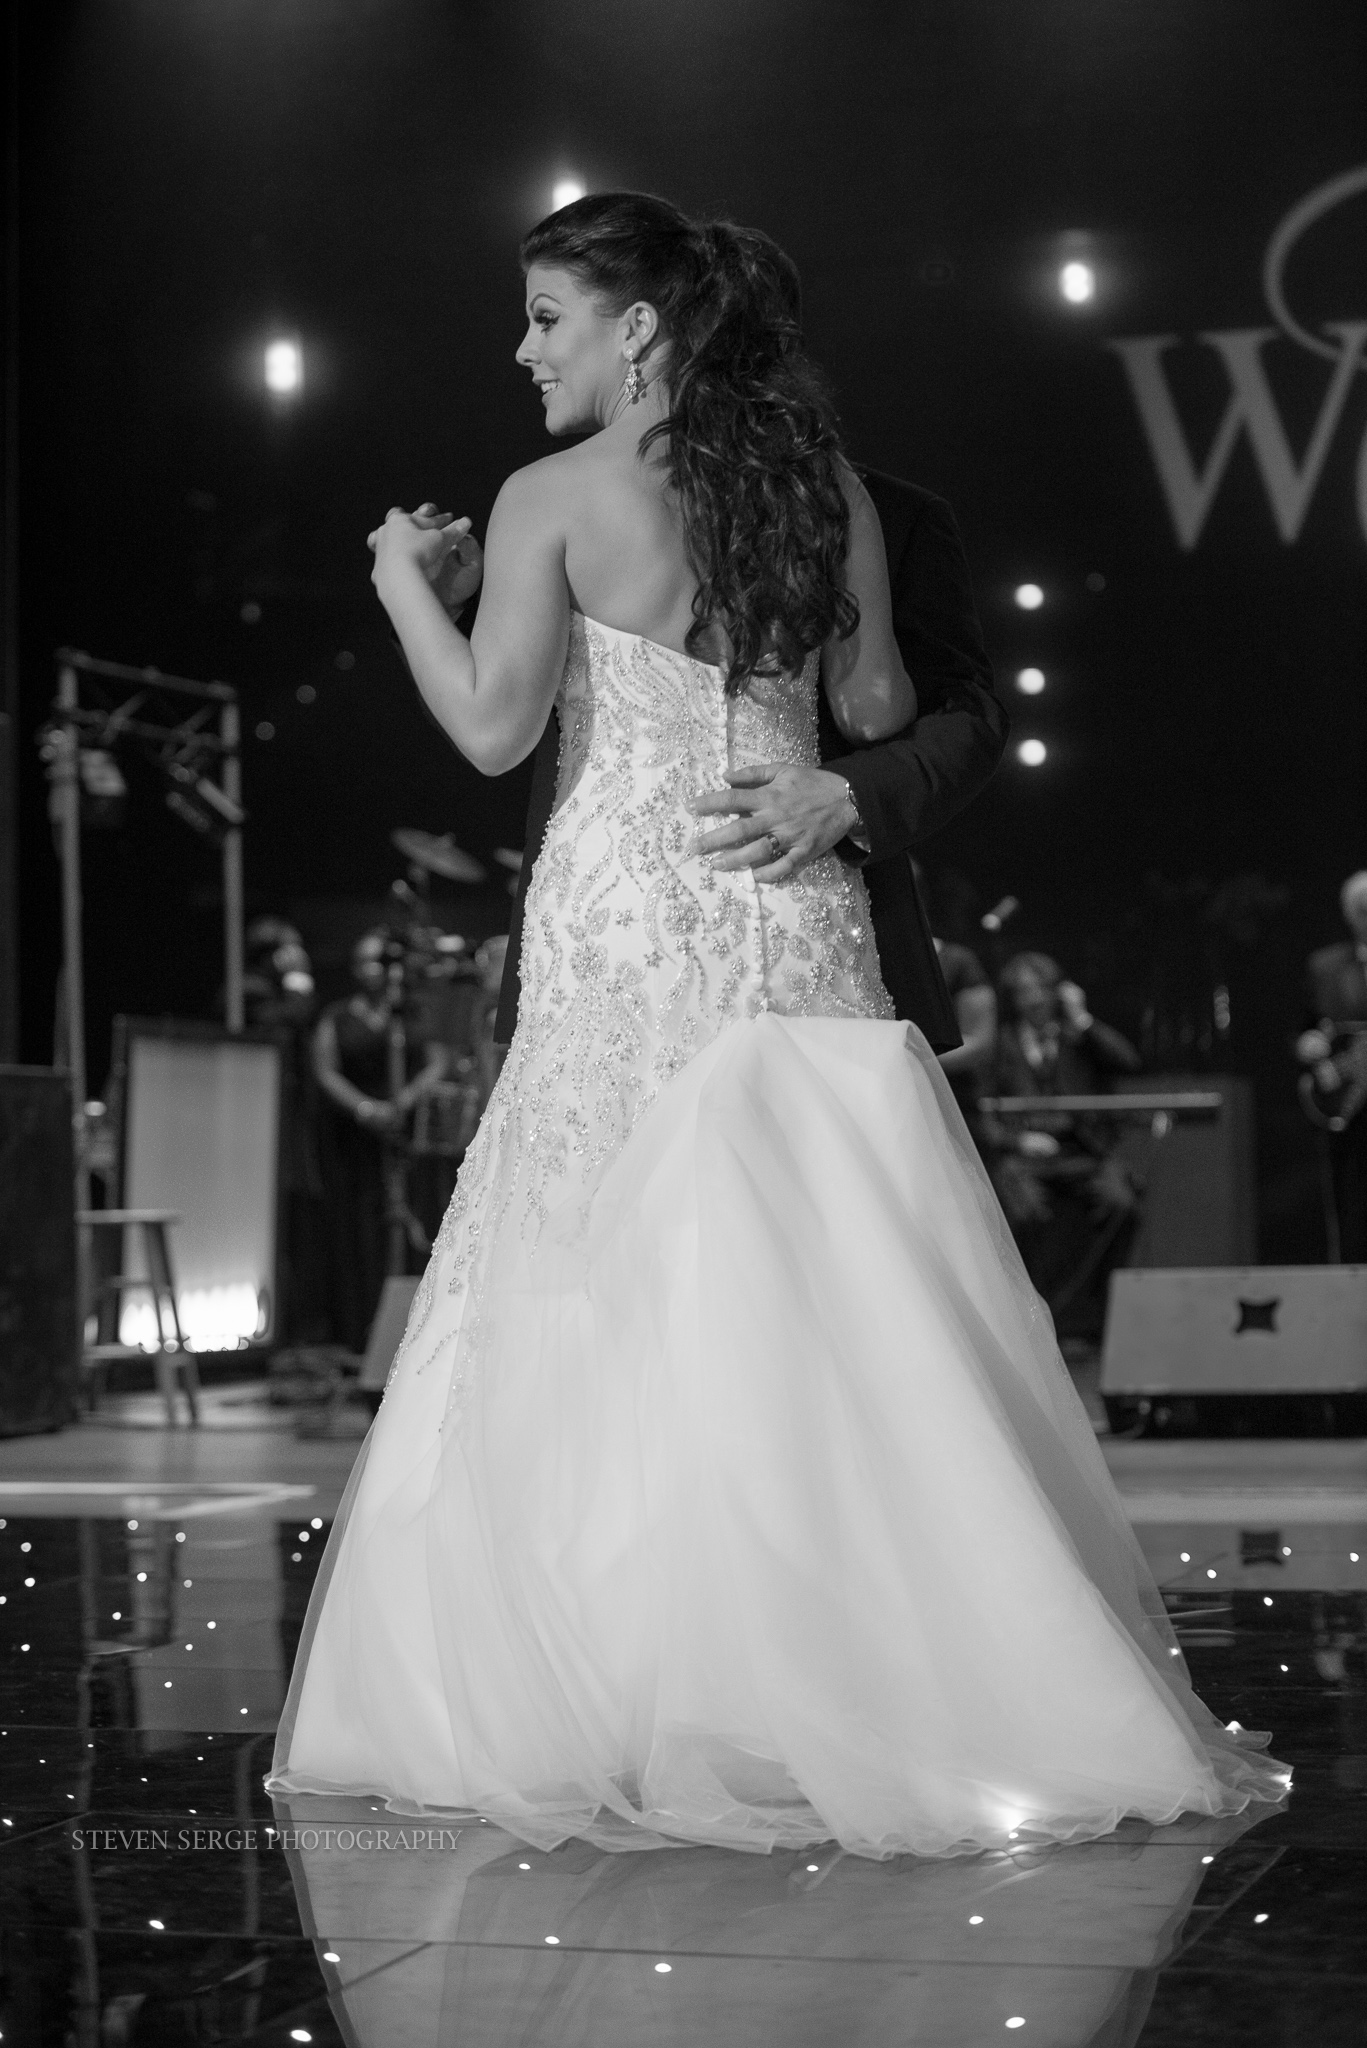 Denn-NEPA-Scranton-wedding-photographer-cultural-downtown-street-photography-dress-8.jpg